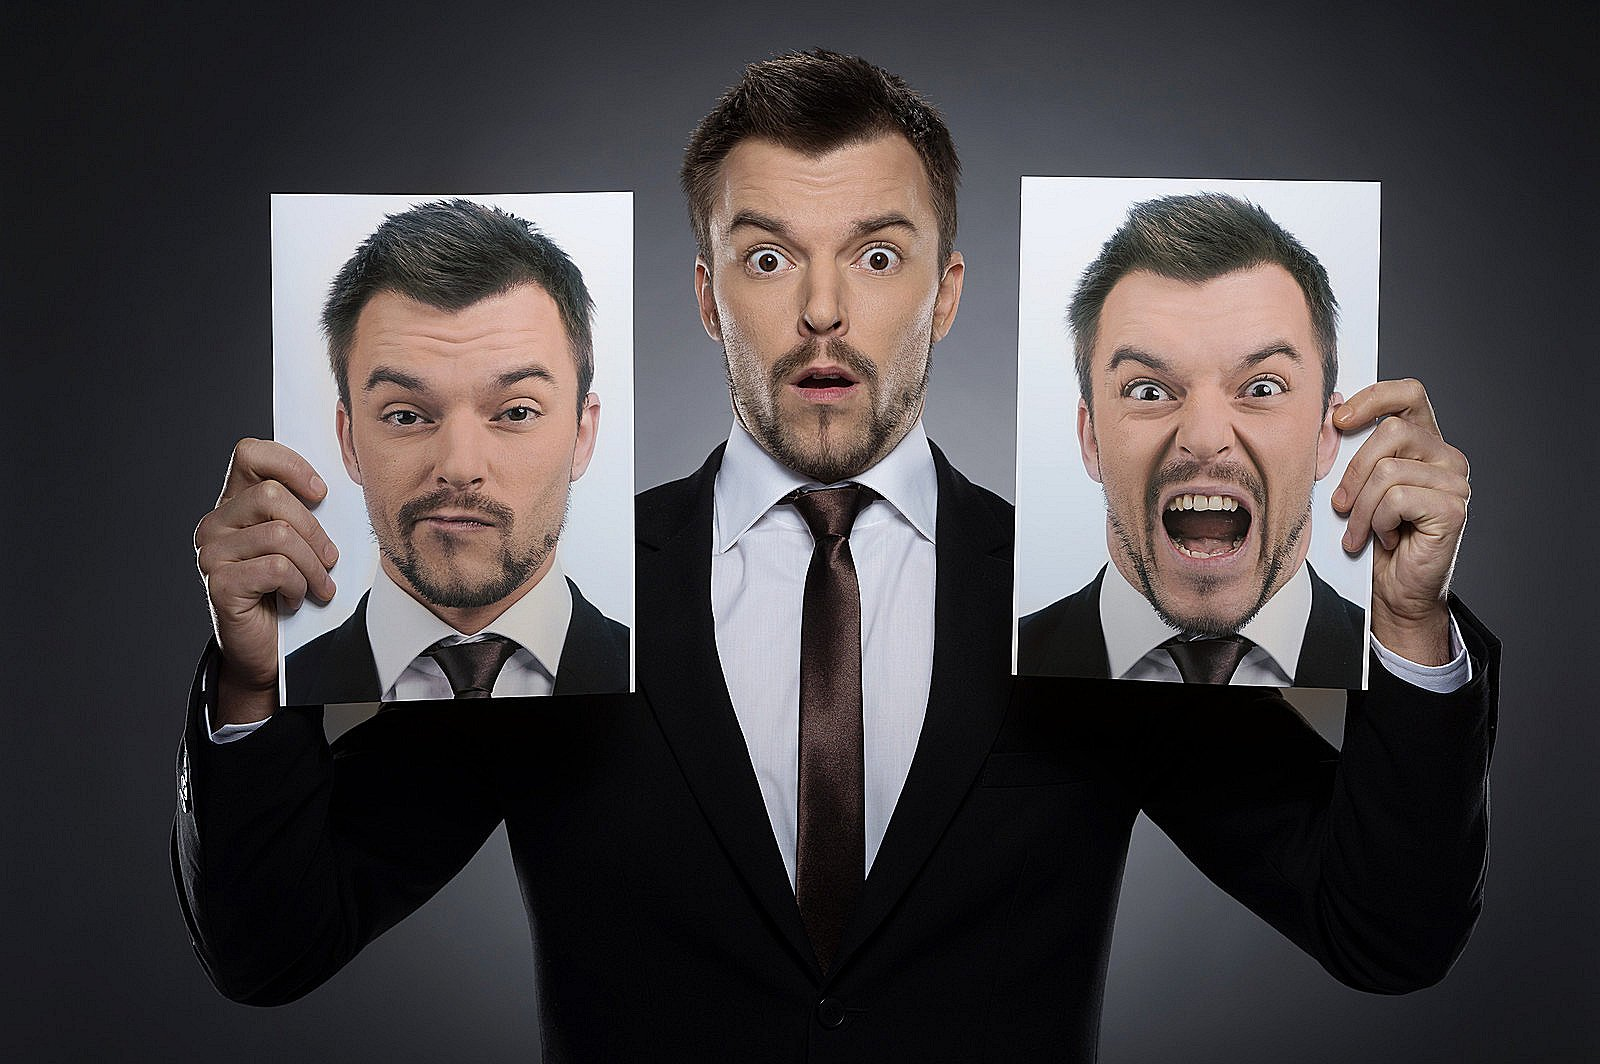 3_faces